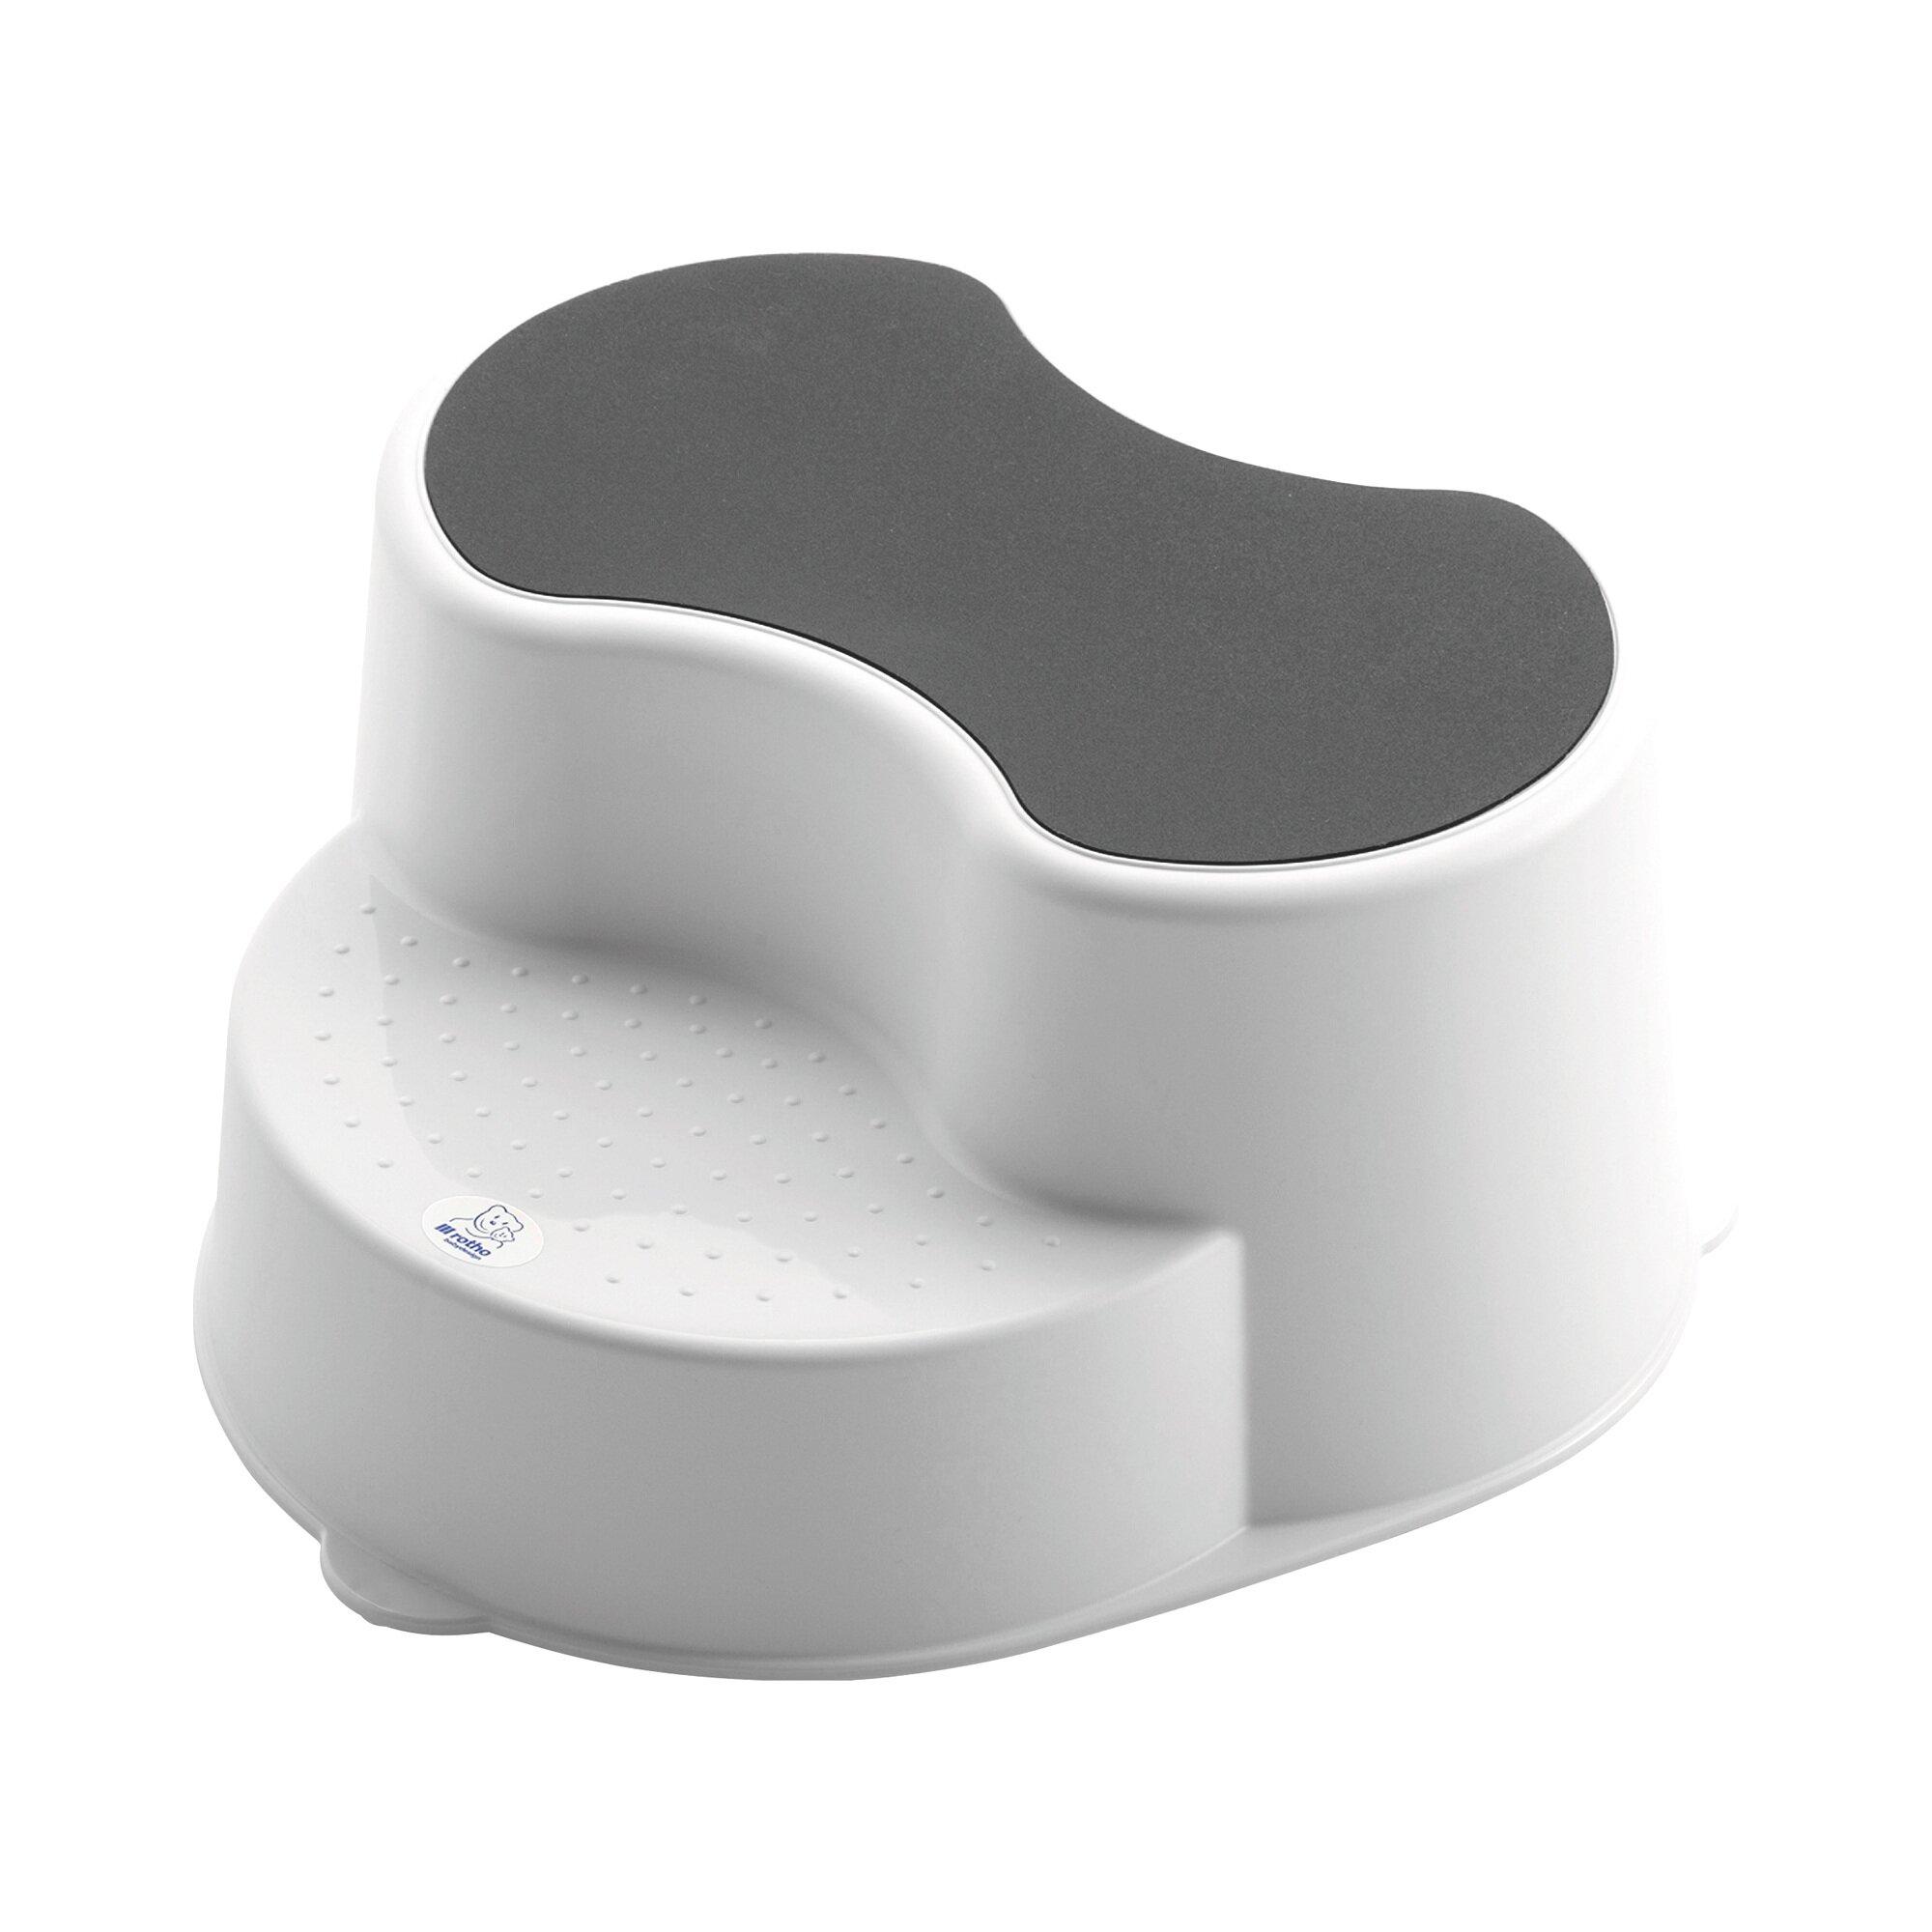 Rotho Babydesign Schemel Top